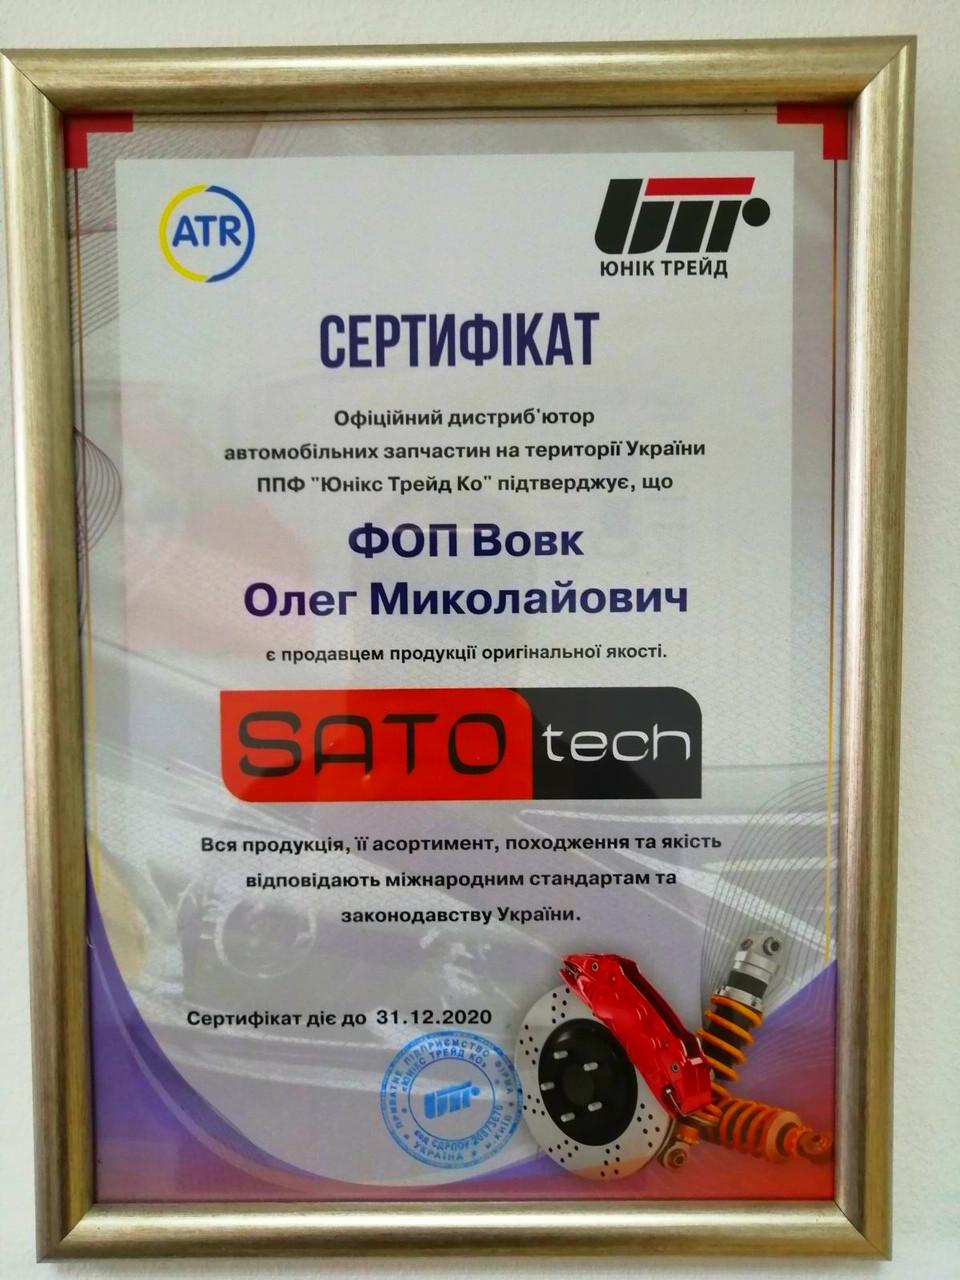 SATO Амортизатор BMW 7 Series (E38) 94-